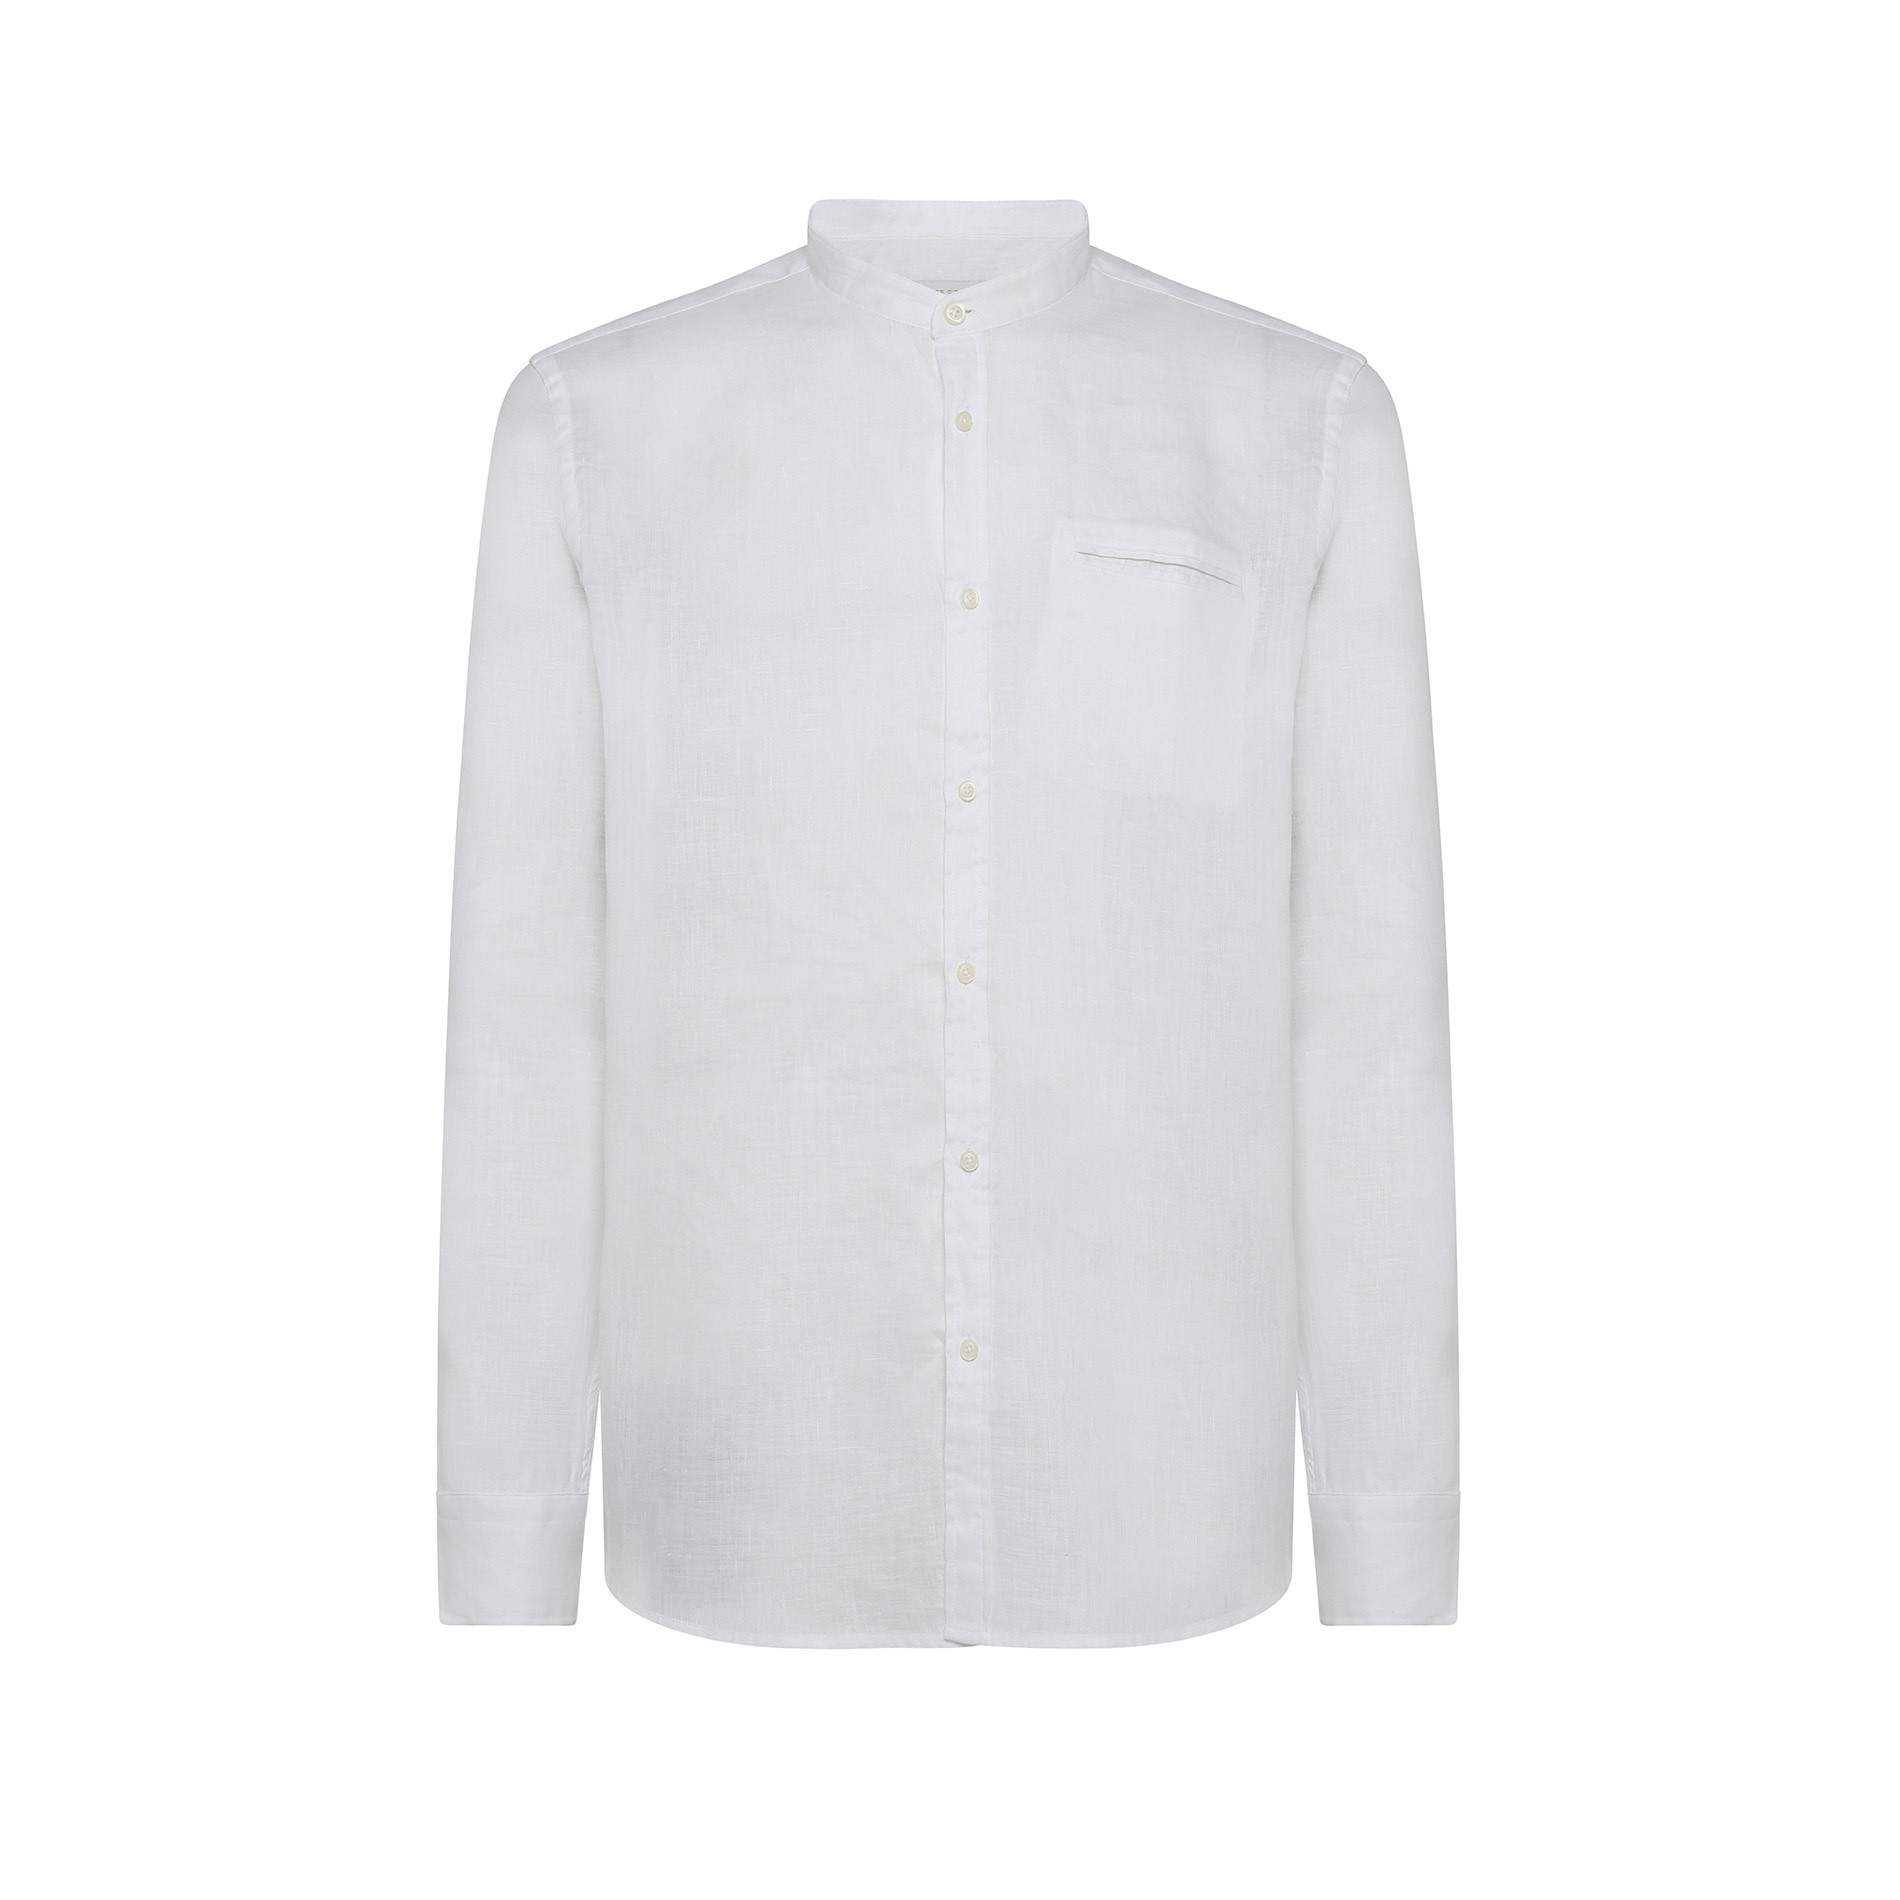 Camicia puro lino tailor fit Luca D'Altieri, Bianco, large image number 0